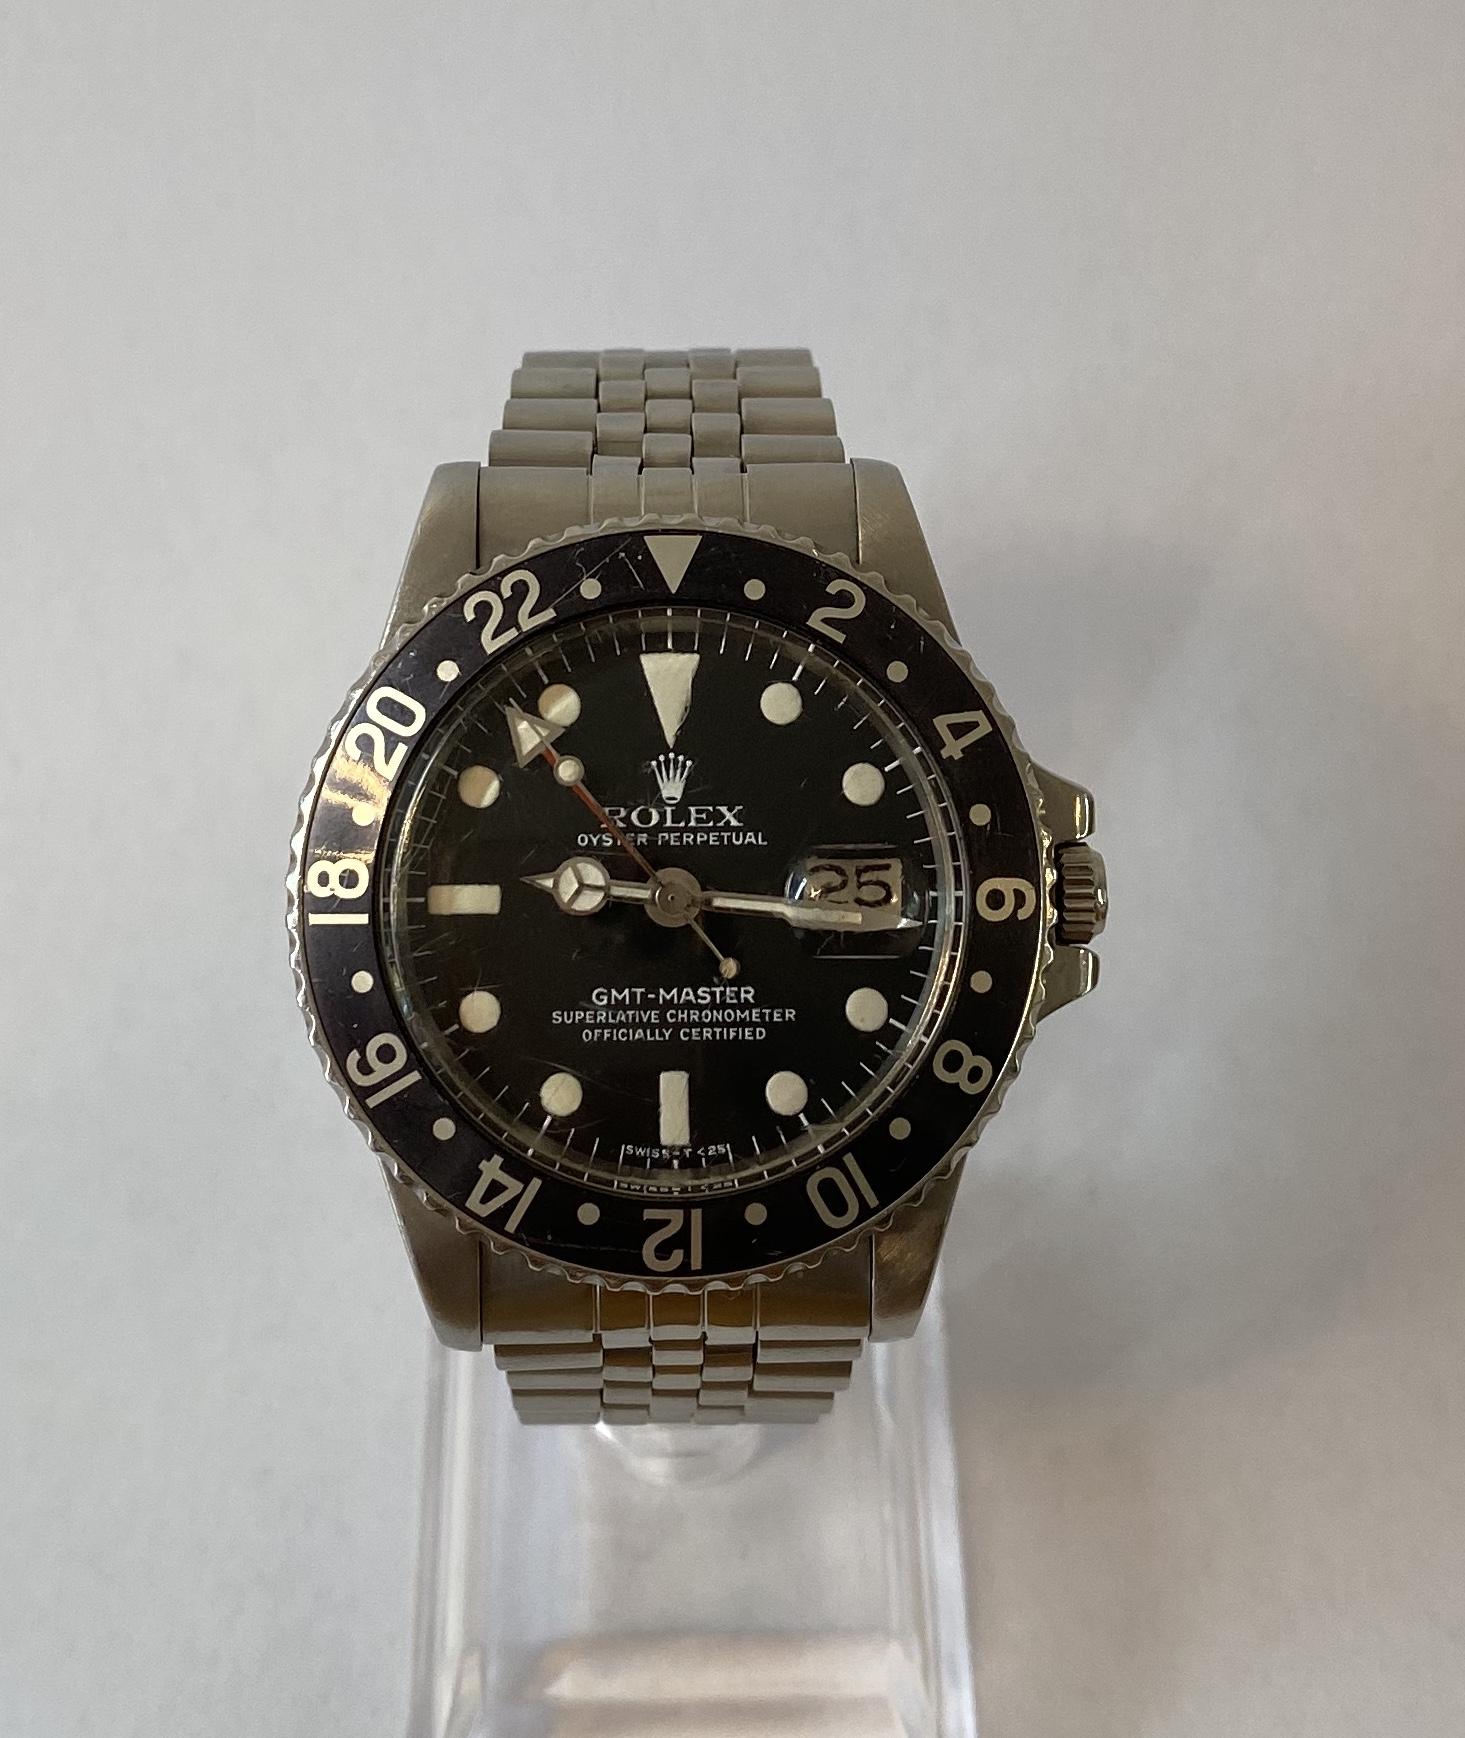 Lot 7 - Rolex GMT Master 1675 (Original & Untouched) *12 MONTH GUARANTEE*